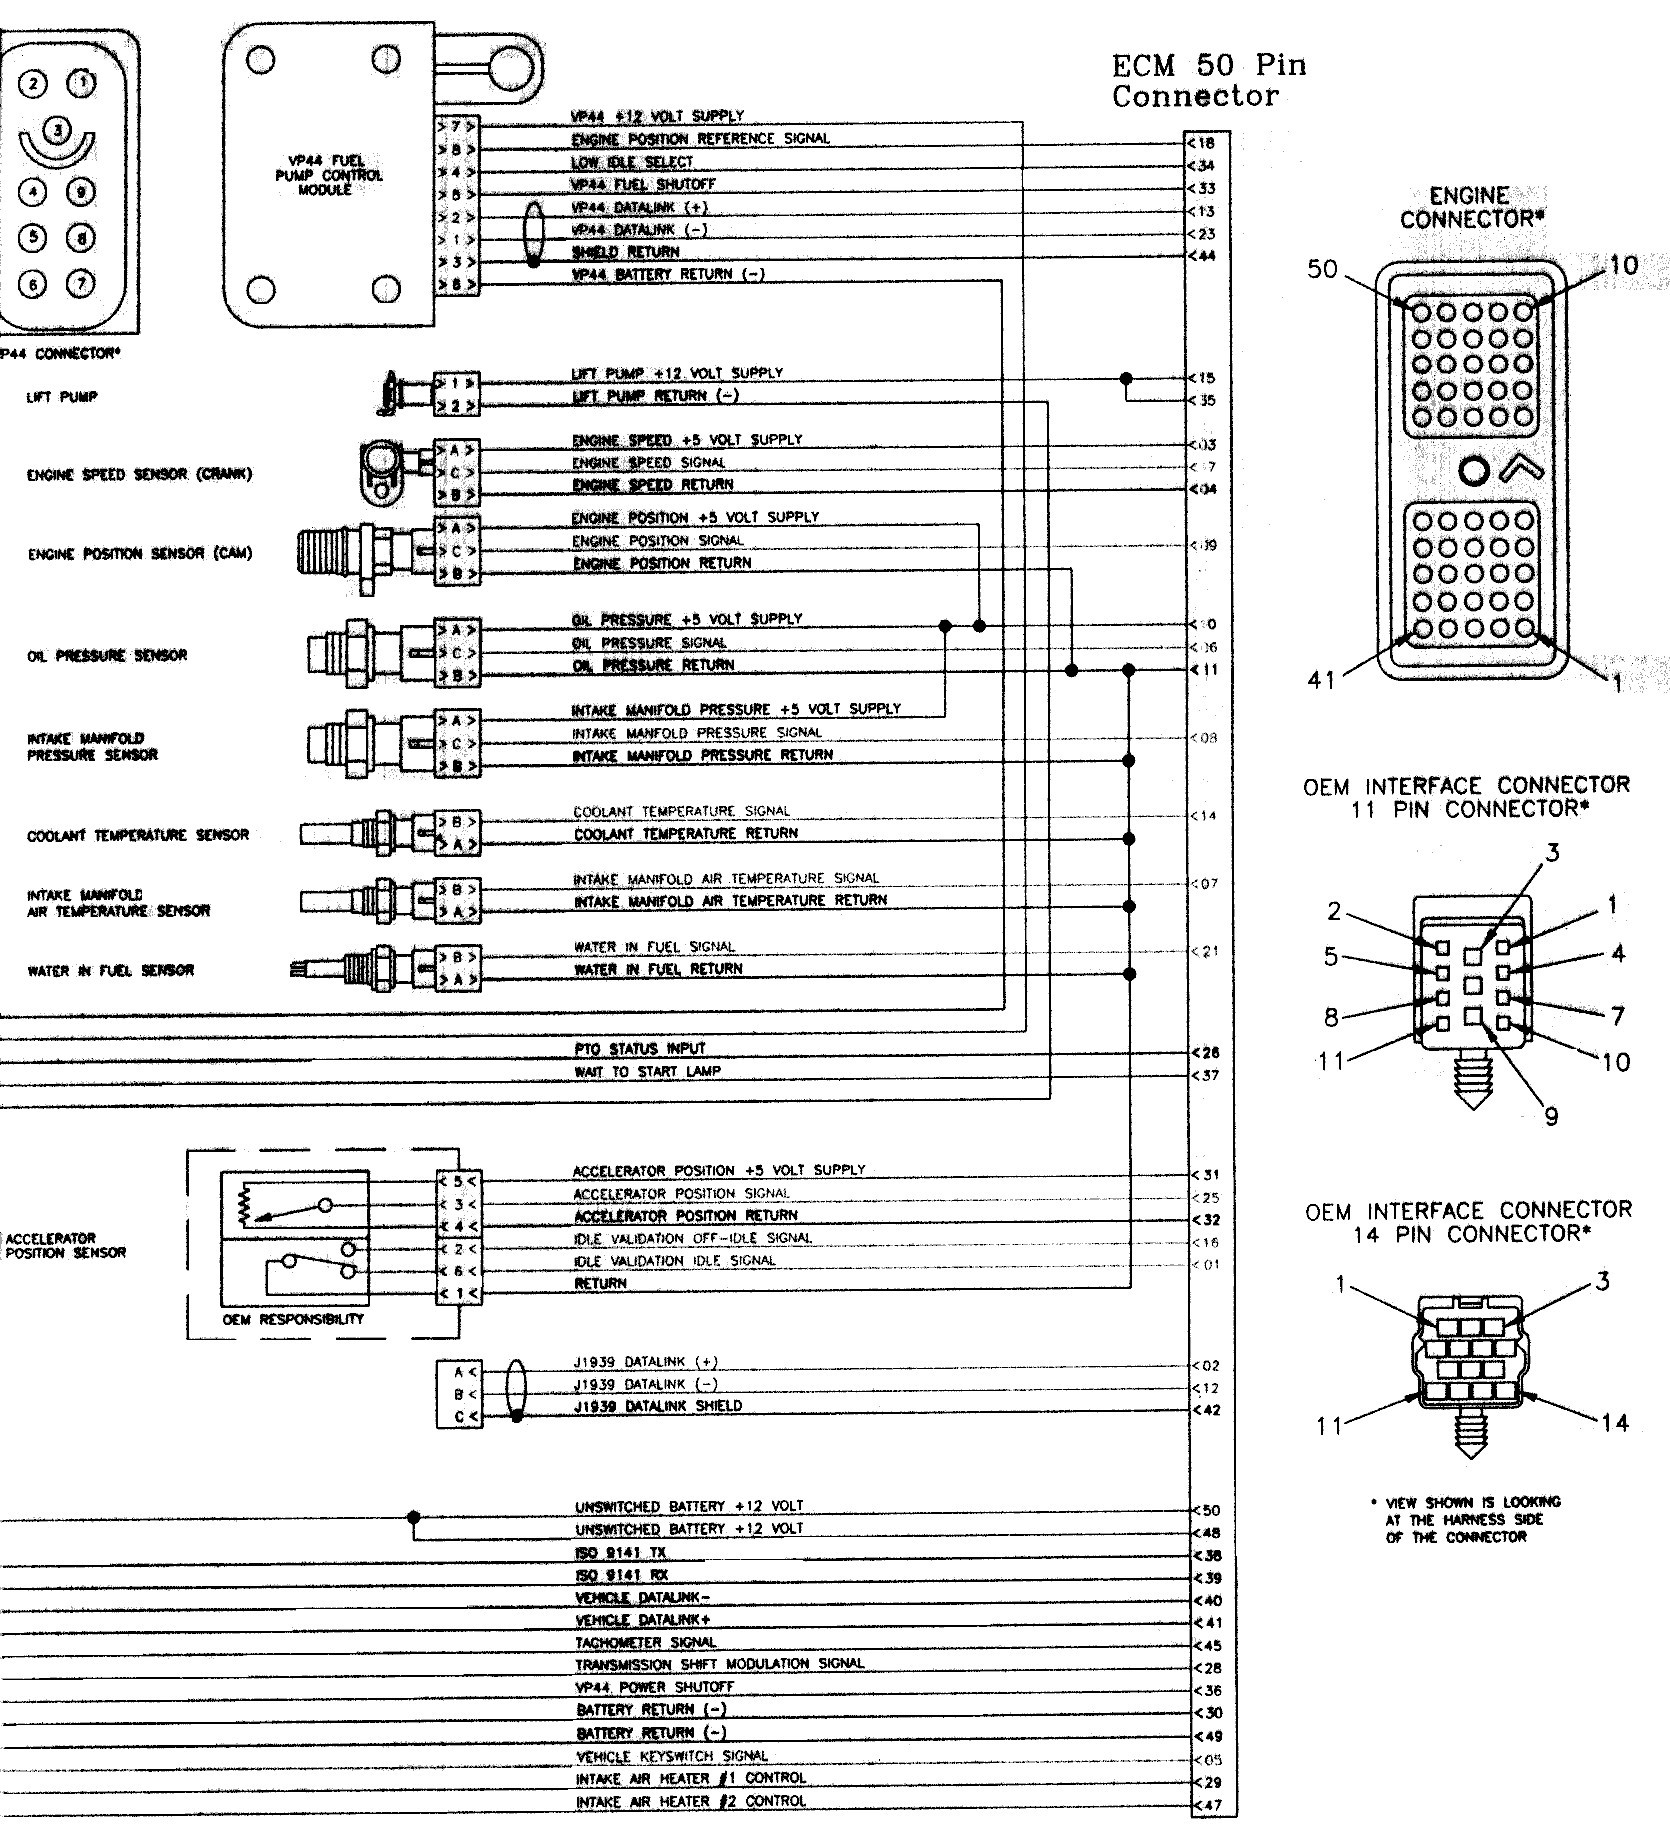 2002 dodge ram 1500 pcm wiring diagram